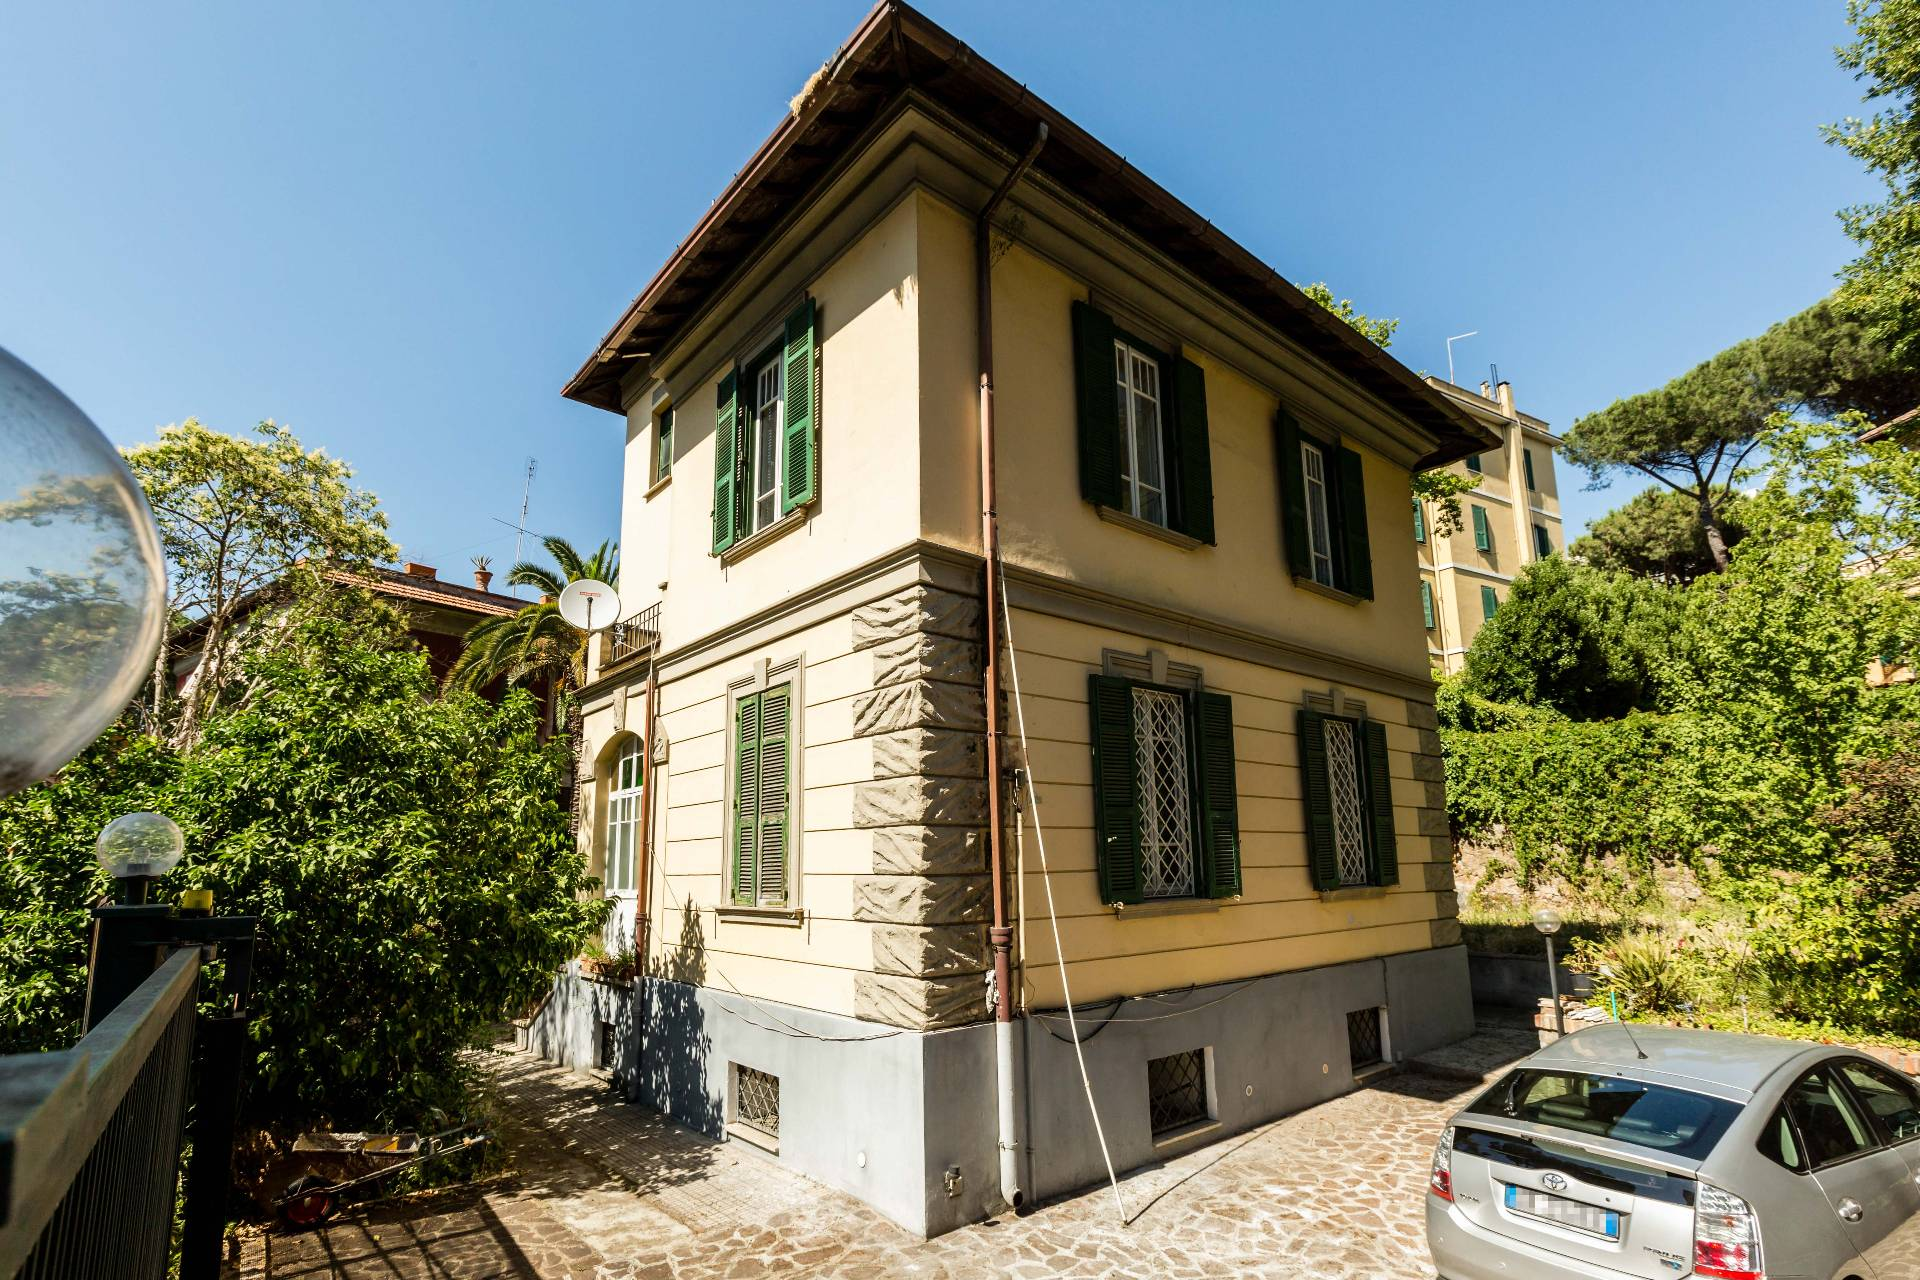 cbi044 645 129653 casa indipendente in vendita a roma